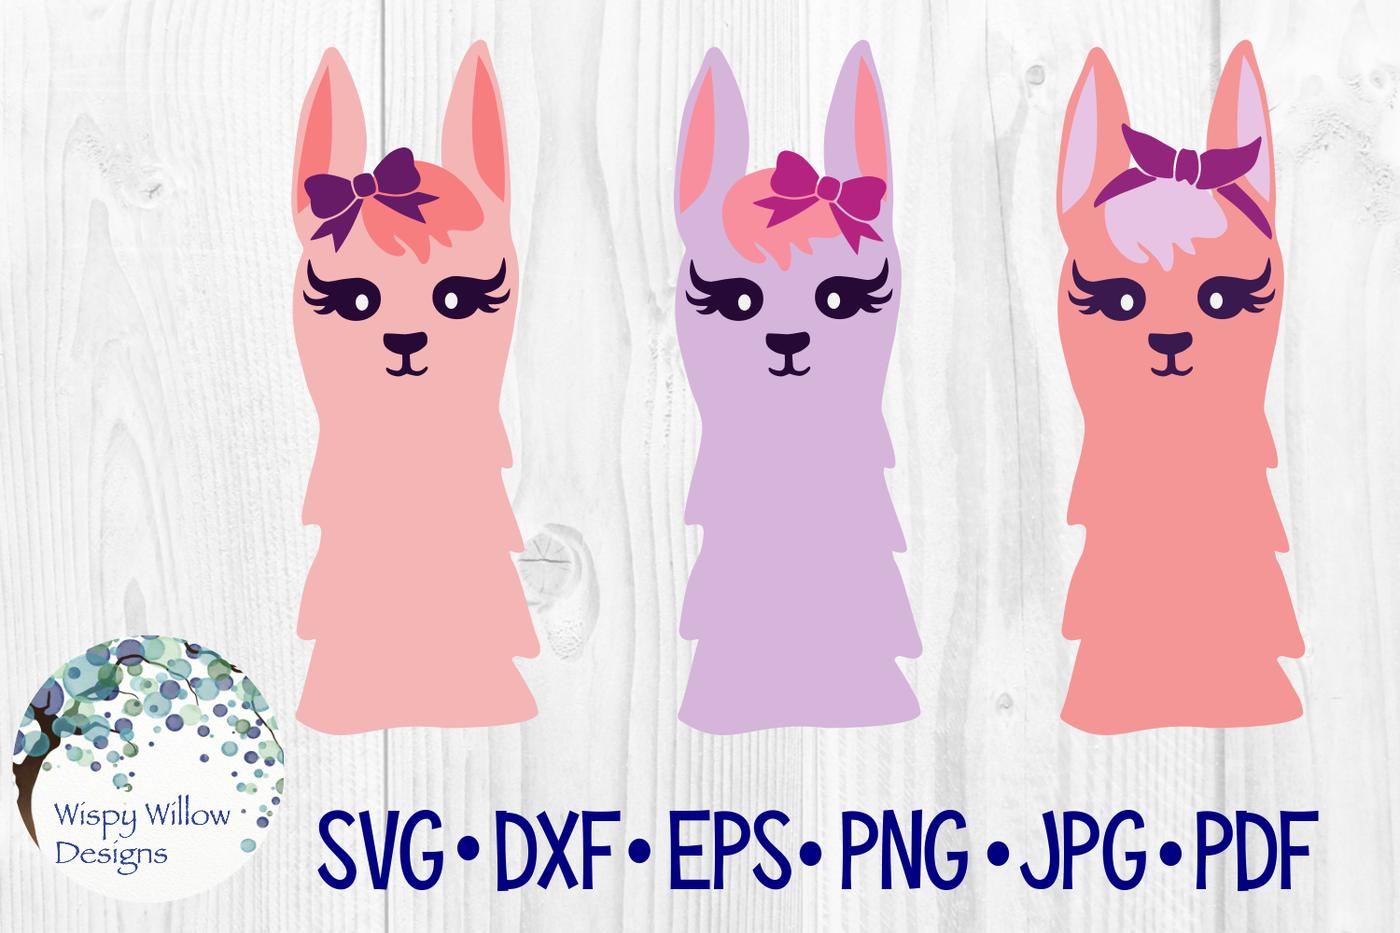 Girly Llama Set Svg Dxf Eps Png Jpg Pdf By Wispy Willow Designs